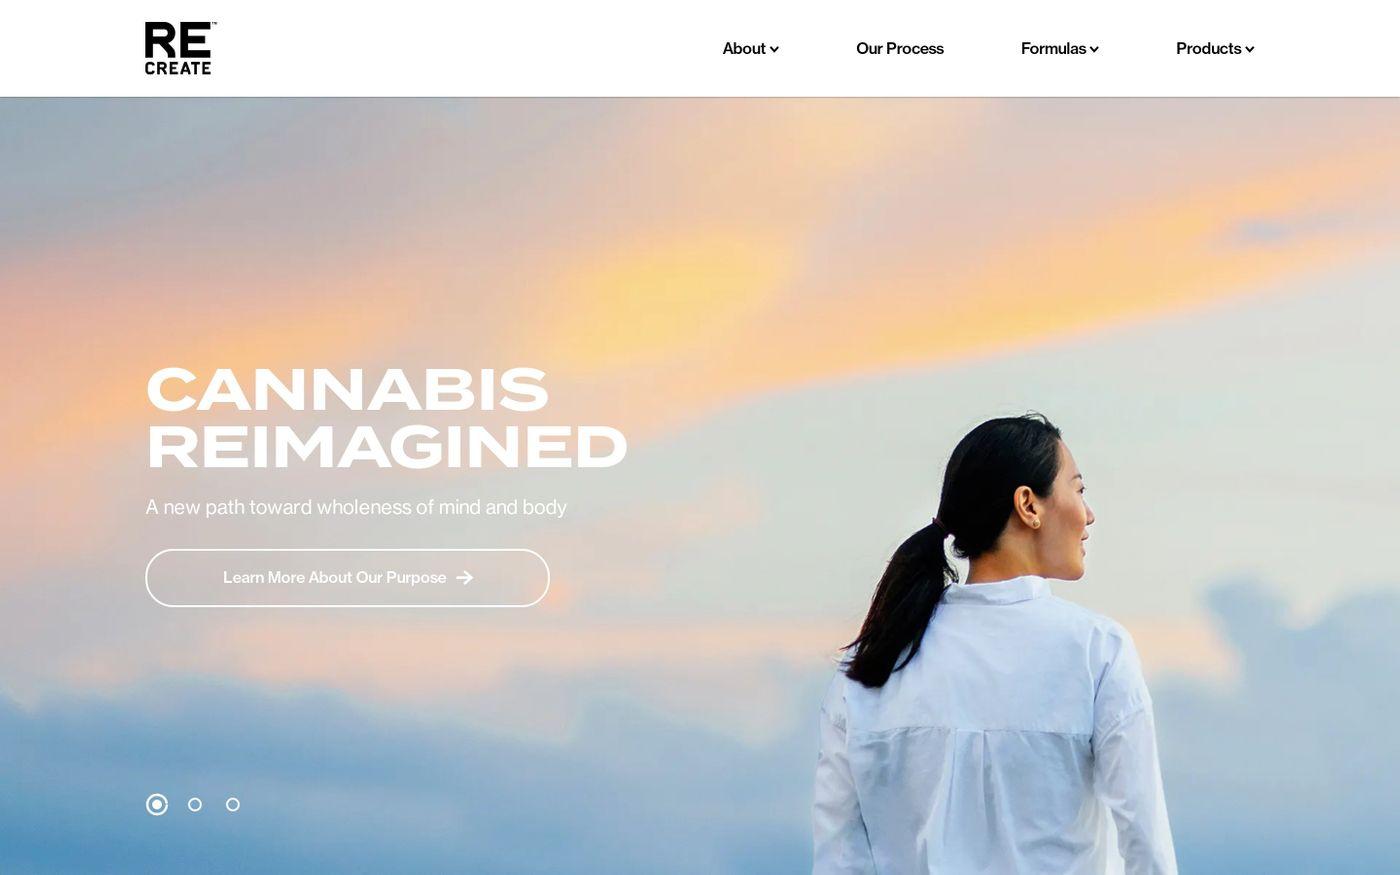 Screenshot of ReCreate website